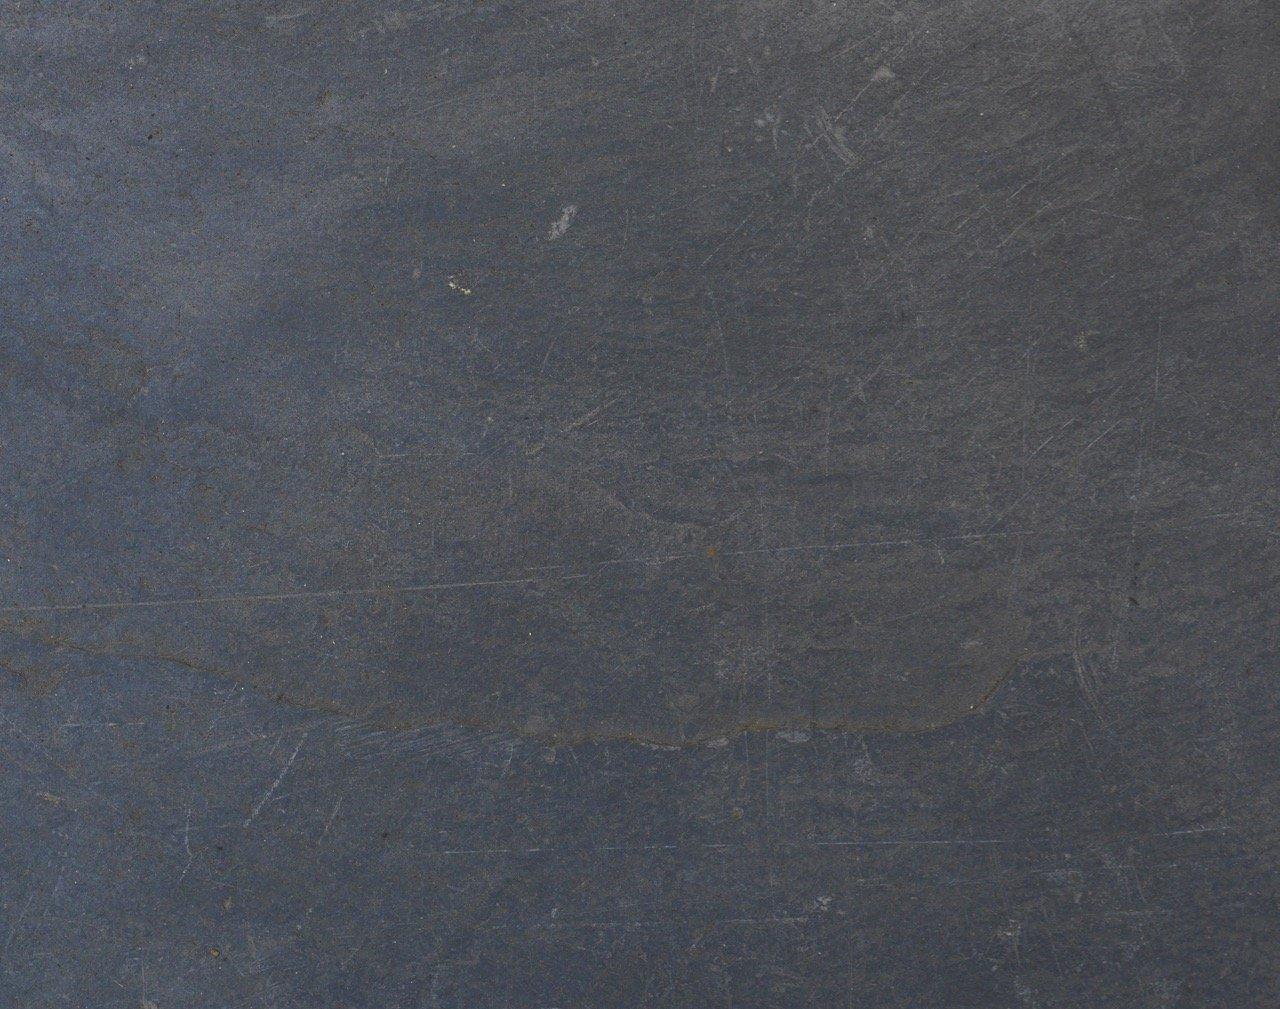 Photo Backdrop Board, 28 in x 22 in x 1/5 in 5 designs (Slate)